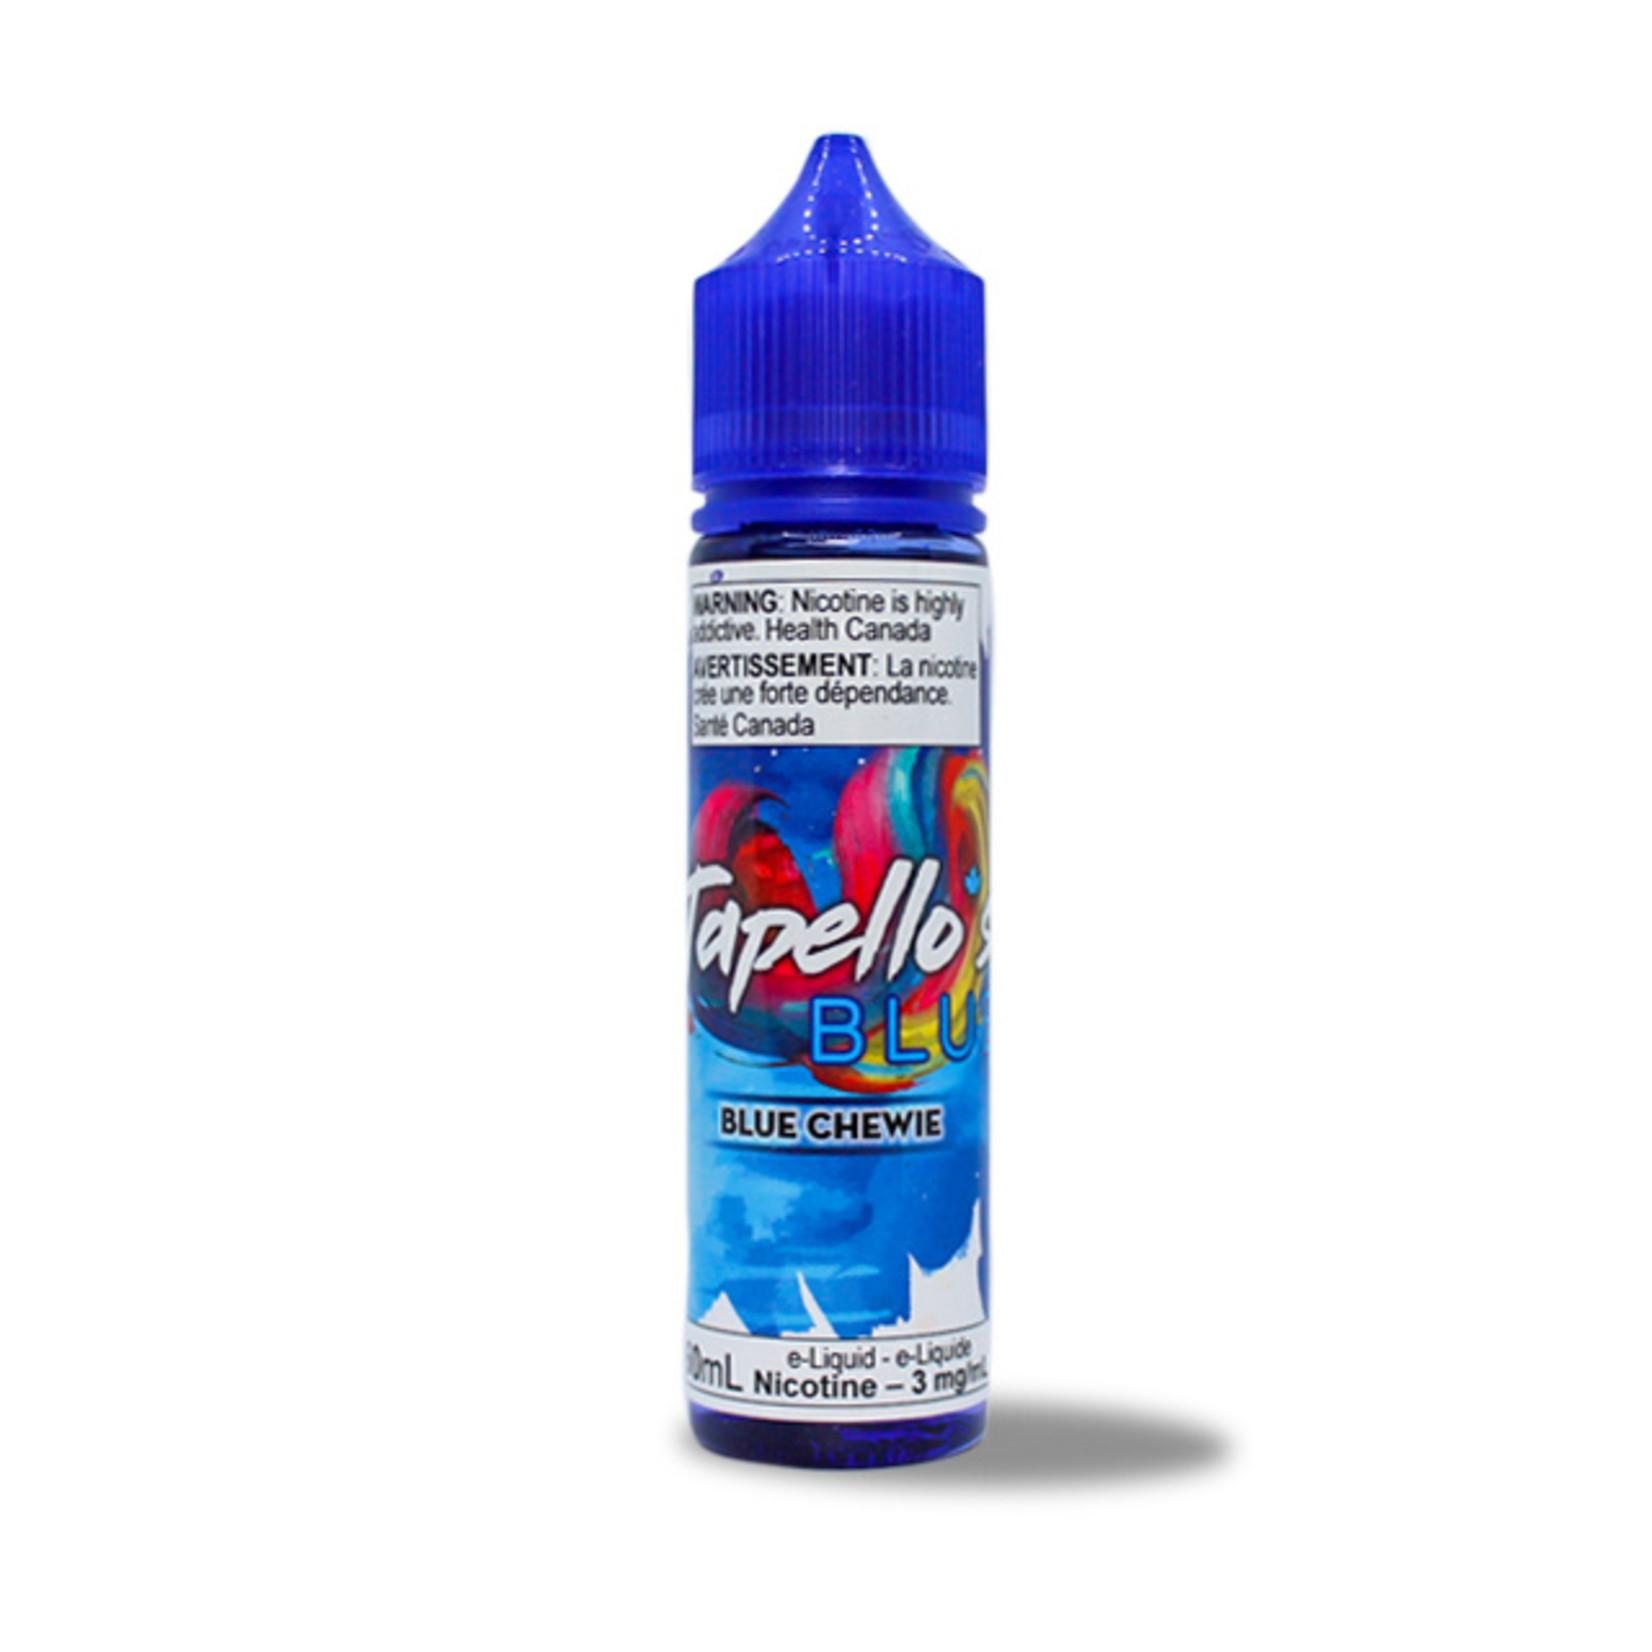 Japello's Blue- Blue Chewie